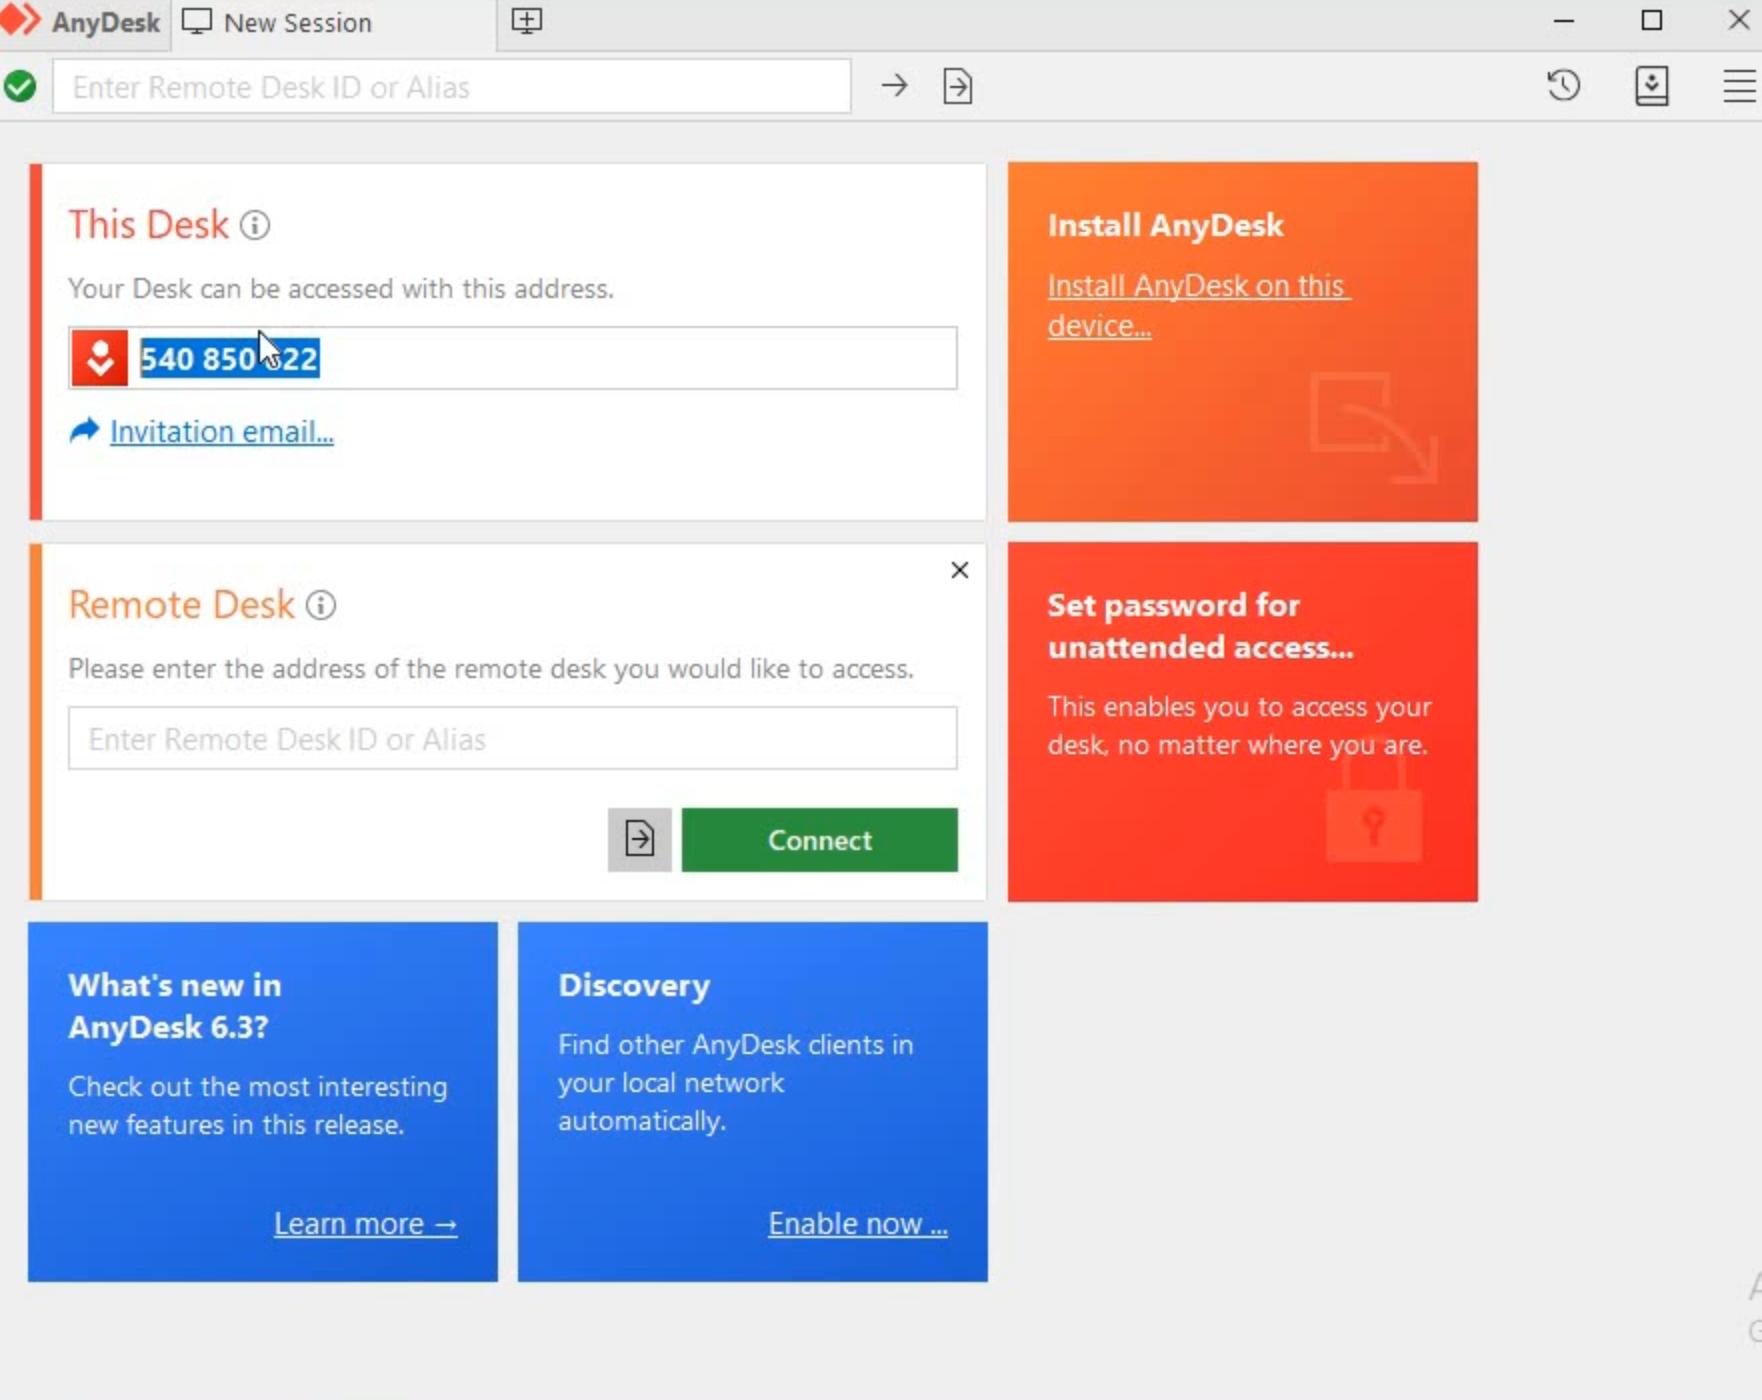 Download now remote desktop tool on windows.